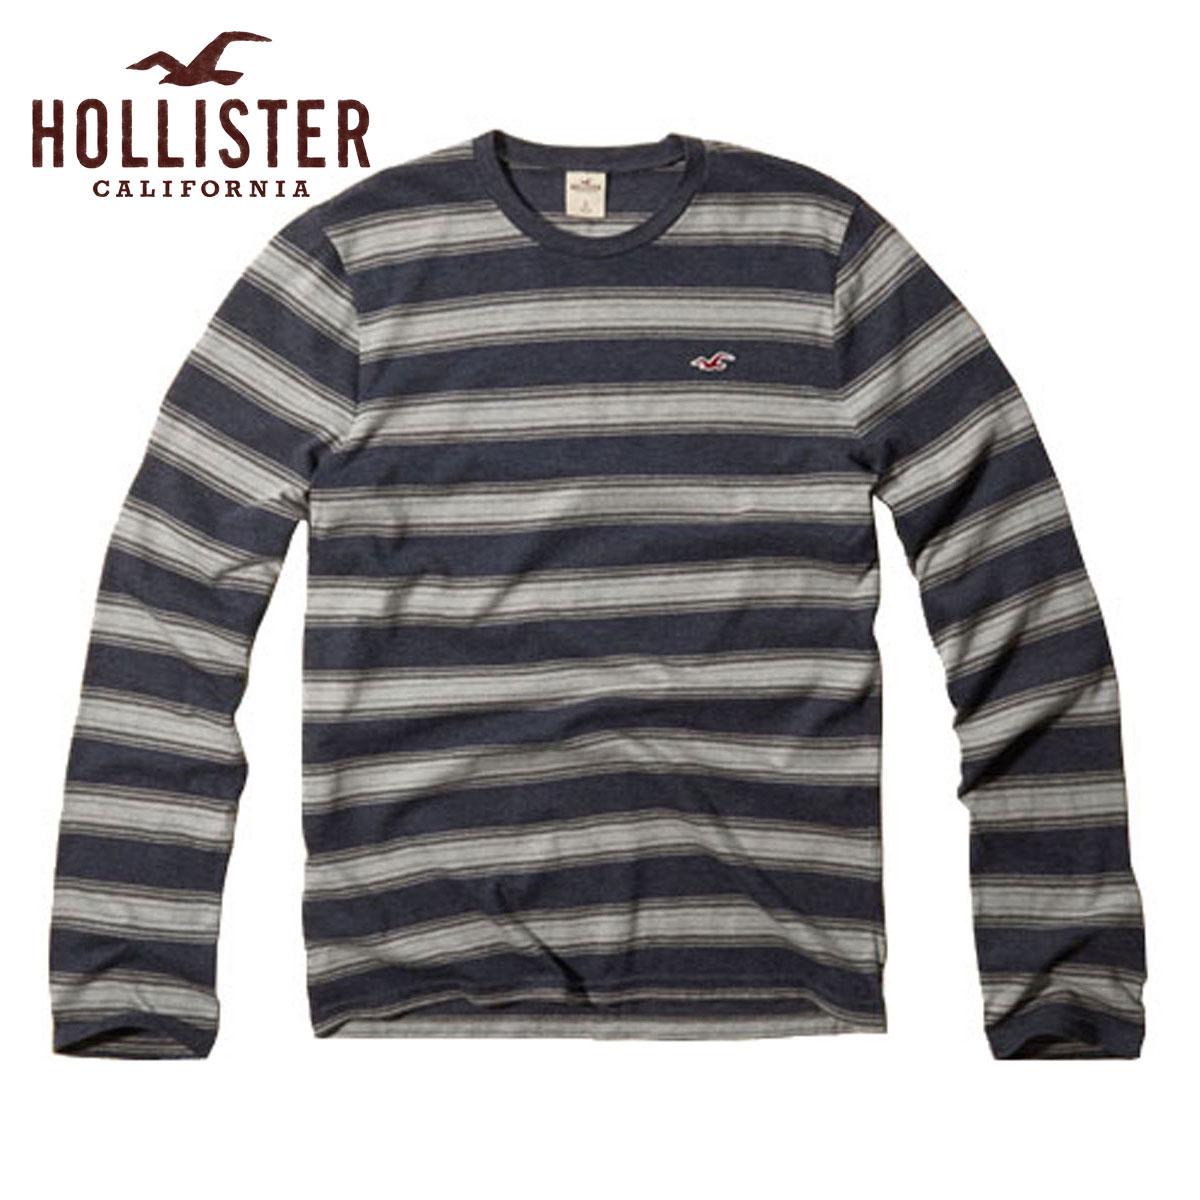 【25%OFFセール 6/26 20:00〜6/30 23:59】 ホリスター HOLLISTER 正規品 メンズ 長袖Tシャツ Arch Bay T-Shirt 324-369-0516-026